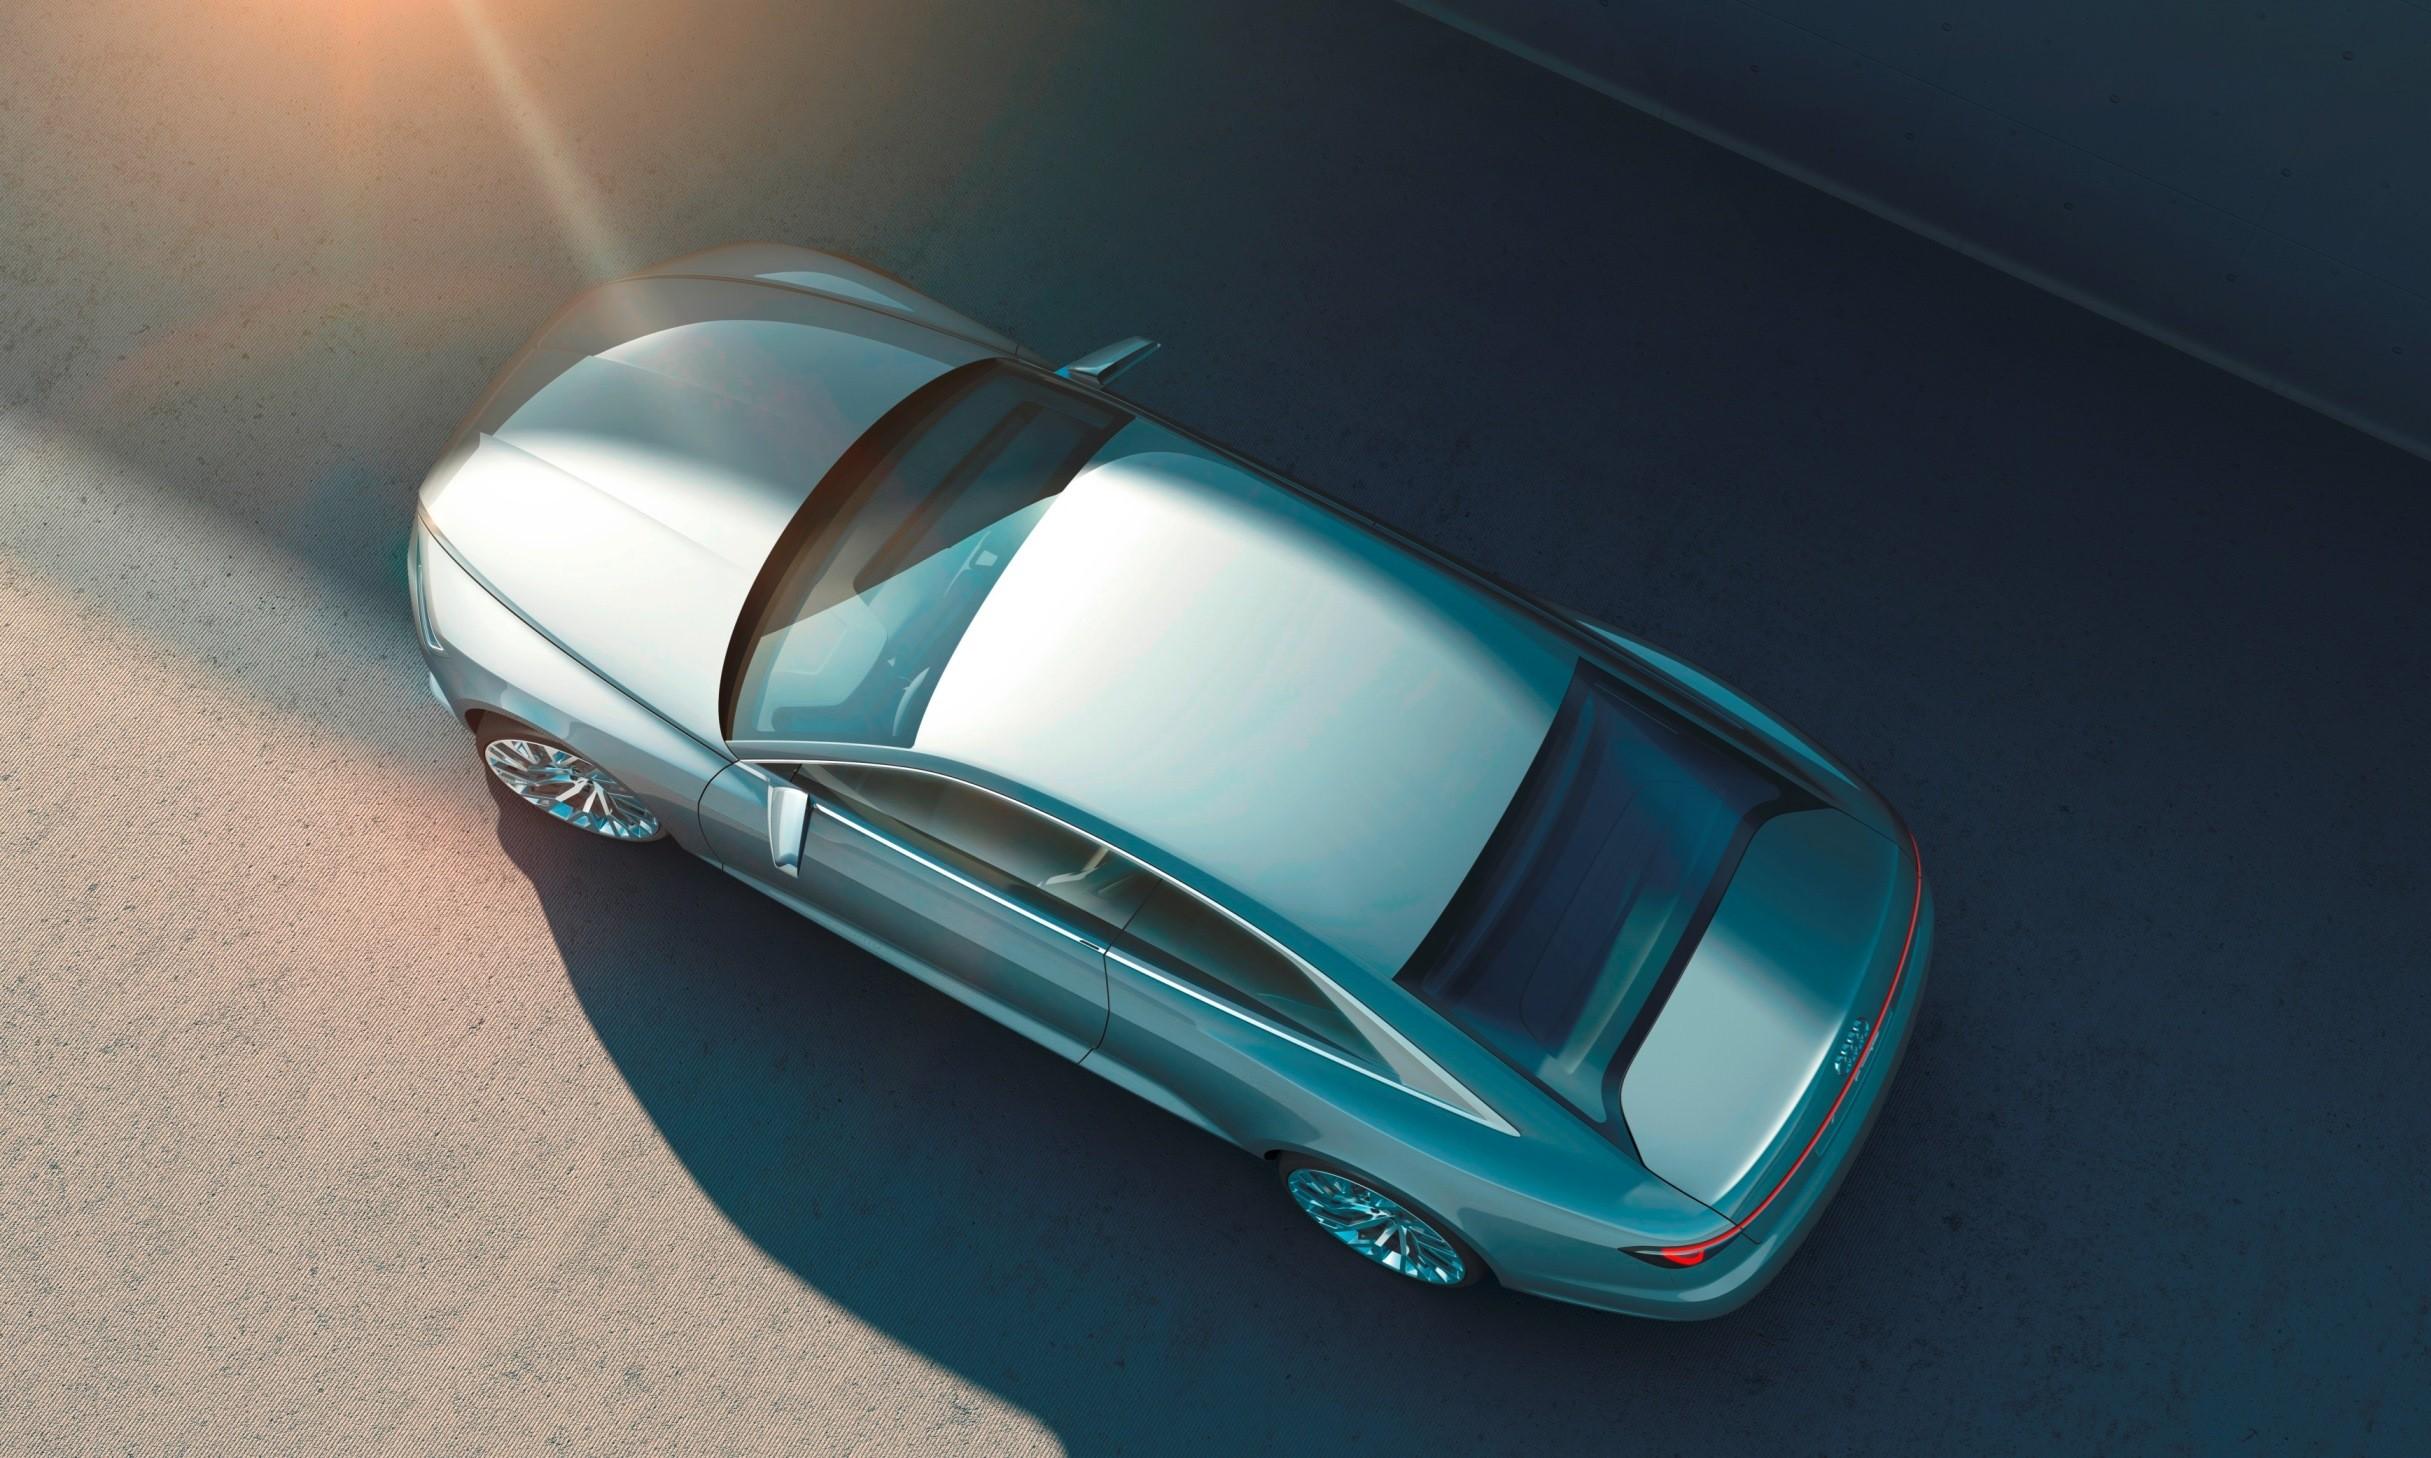 2014 Audi Prologue is Worst of LA 2014 8